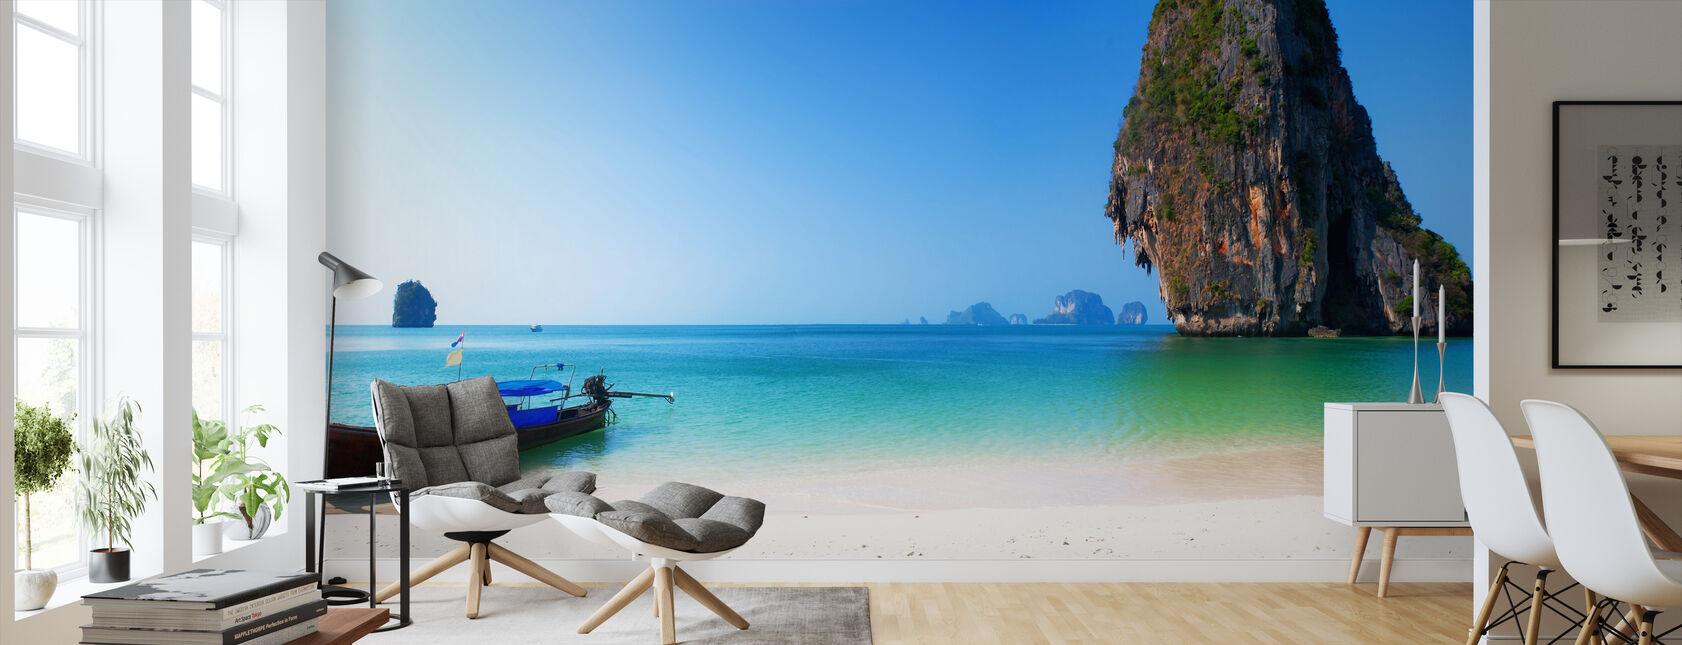 Thailand Island Beach - Wallpaper - Living Room